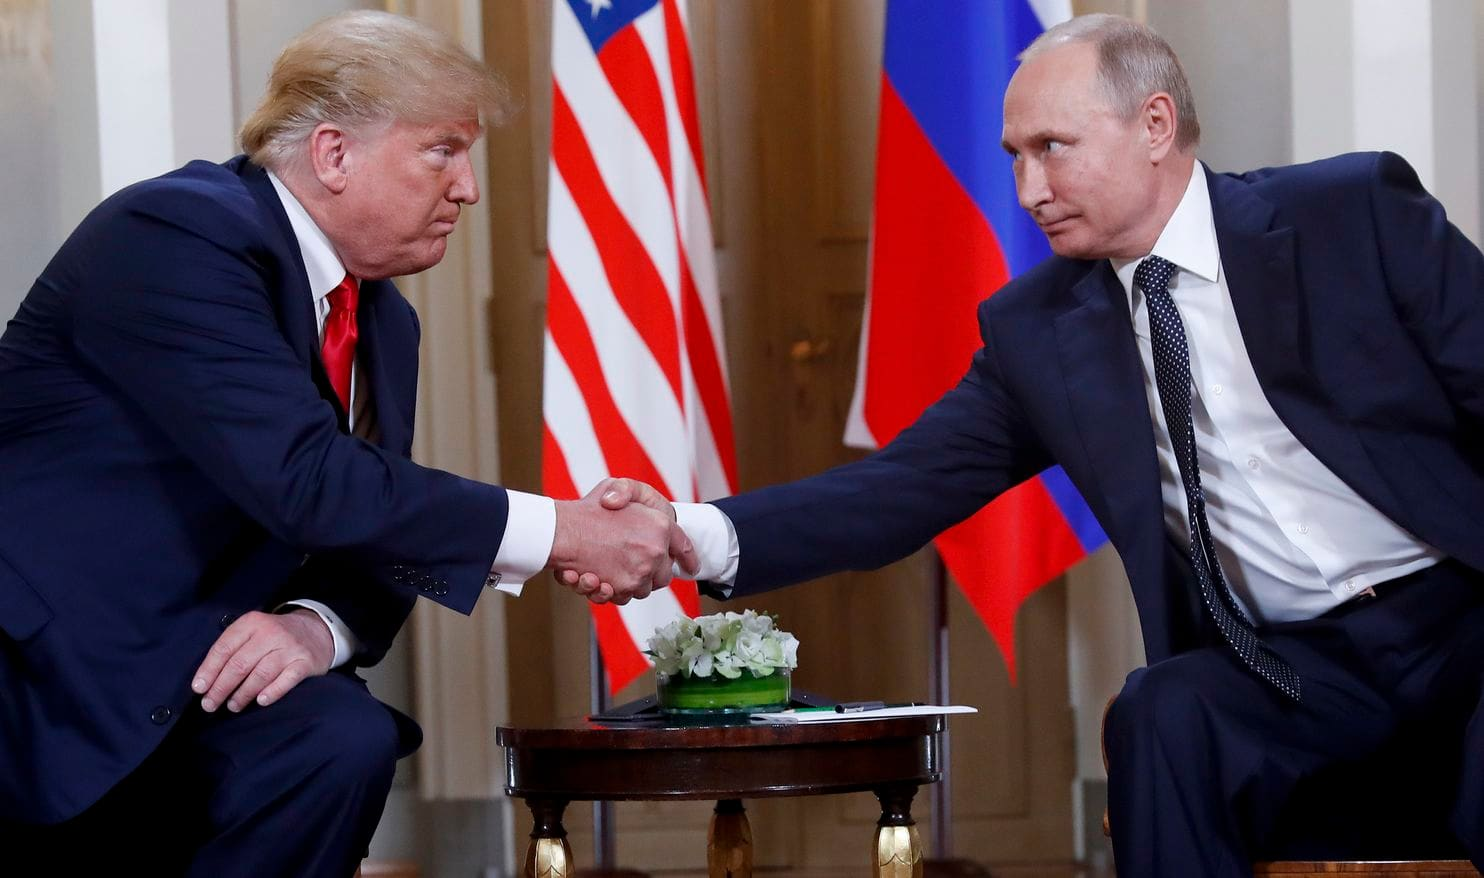 Putin and Trump set to meet in Paris on Nov. 11: Kremlin